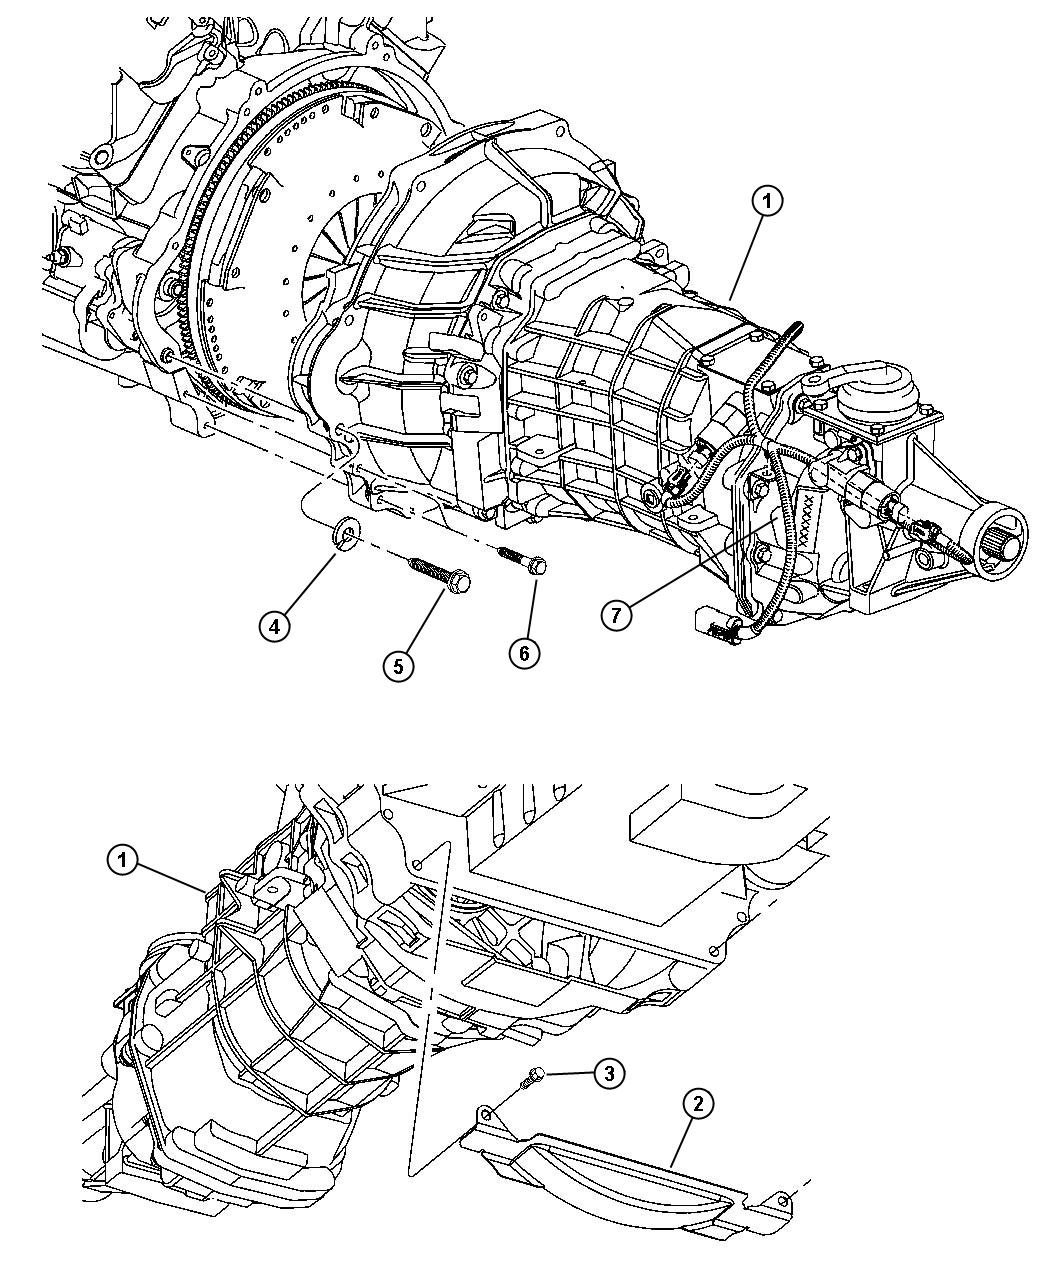 Dodge 6 speed manual transmission problems